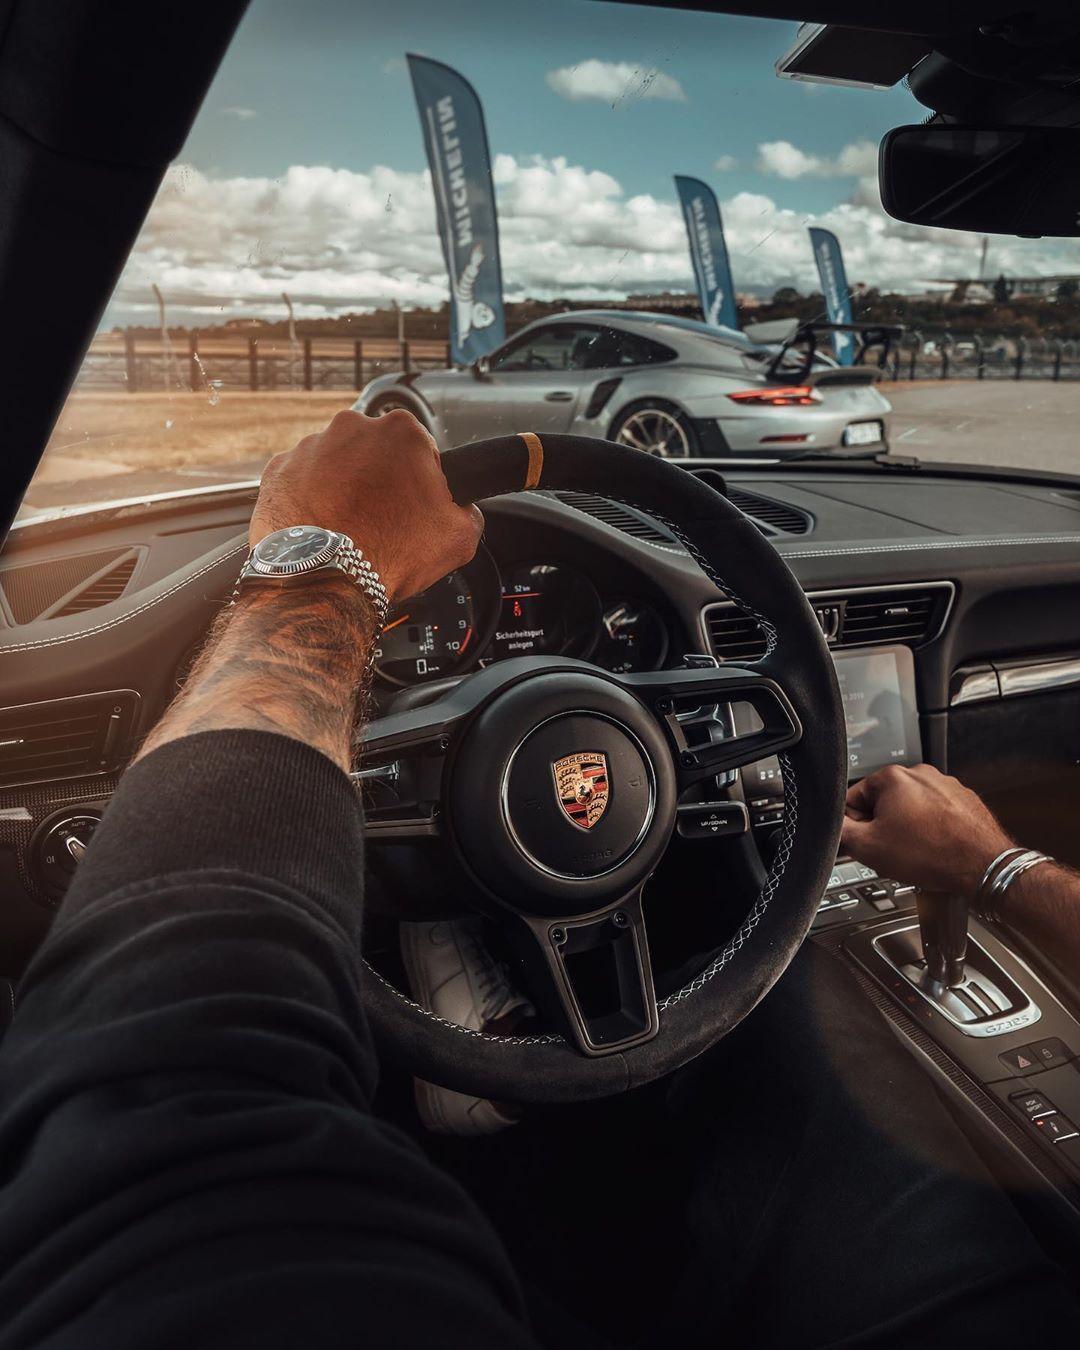 Follow Mr Goodlife On Instagram Luxury Lifestyle Goals Luxurylifestyle Luxurygoals Luxu Luxury Lifestyle Dreams Luxury Lifestyle Travel The World For Free